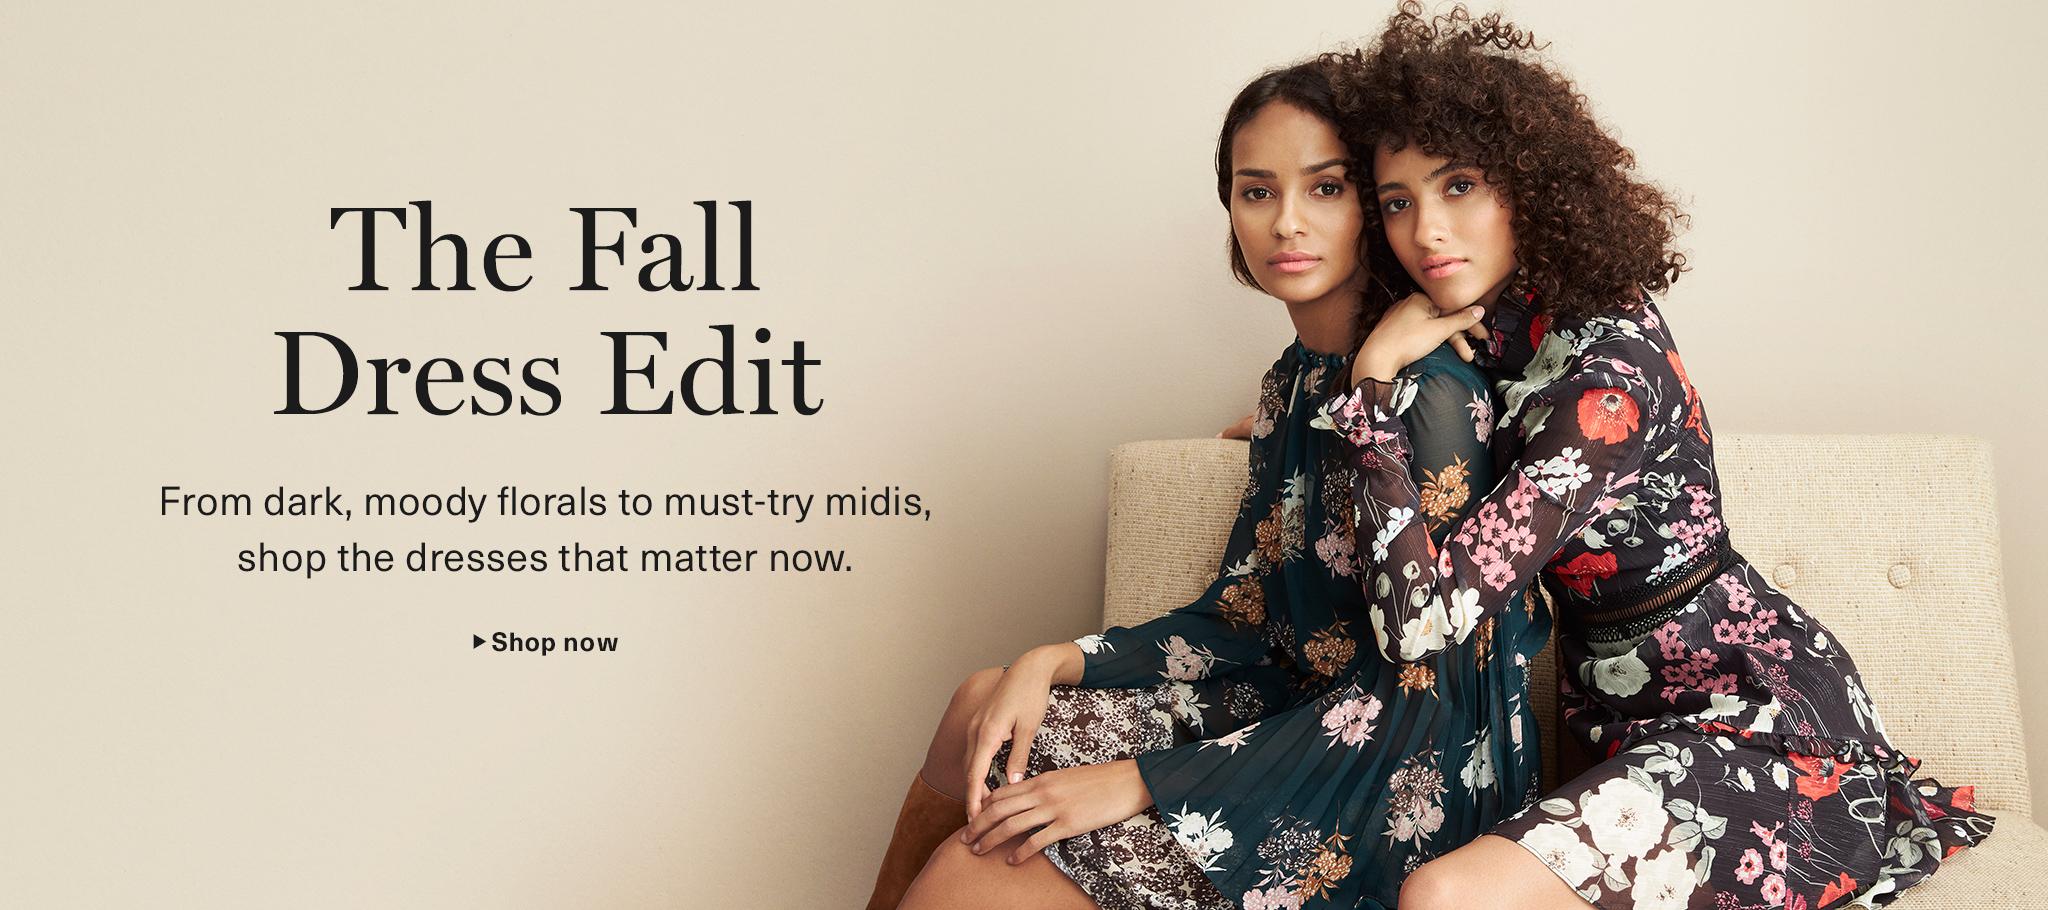 The Fall Dress Edit